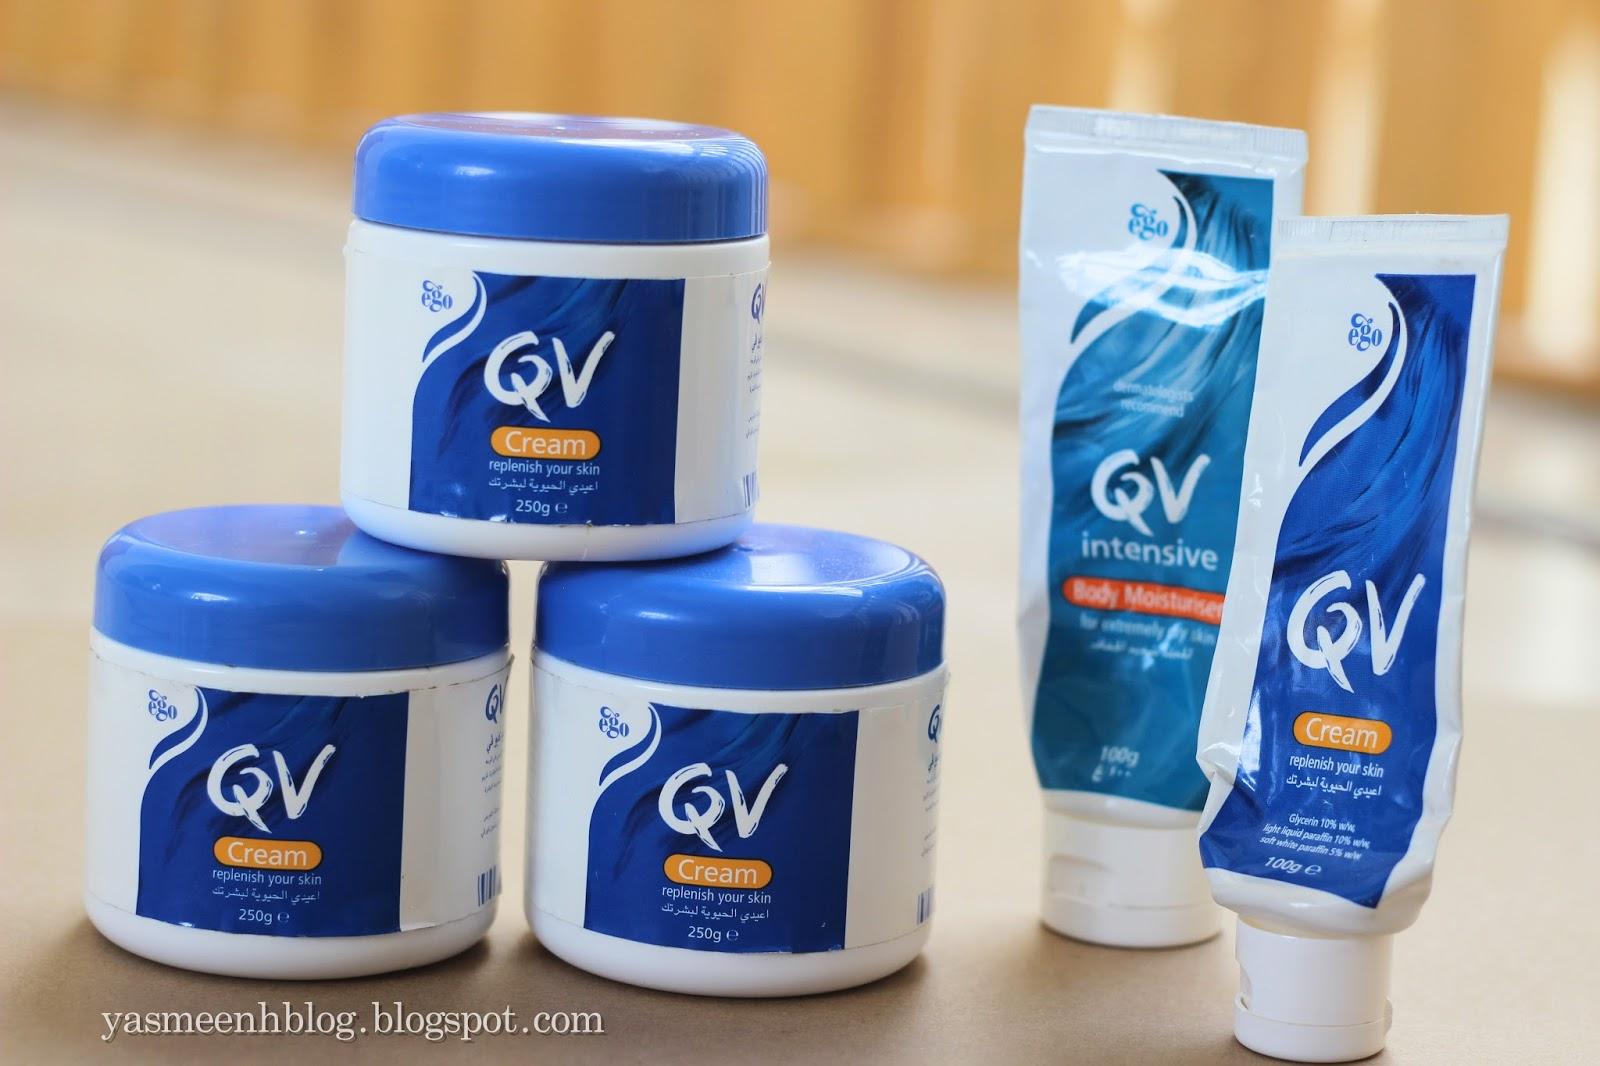 تجربتي مع ترطيب الجسمcetaphil Qv Avalon Pharma Glysolid Johnsons Yasmeen S Blog